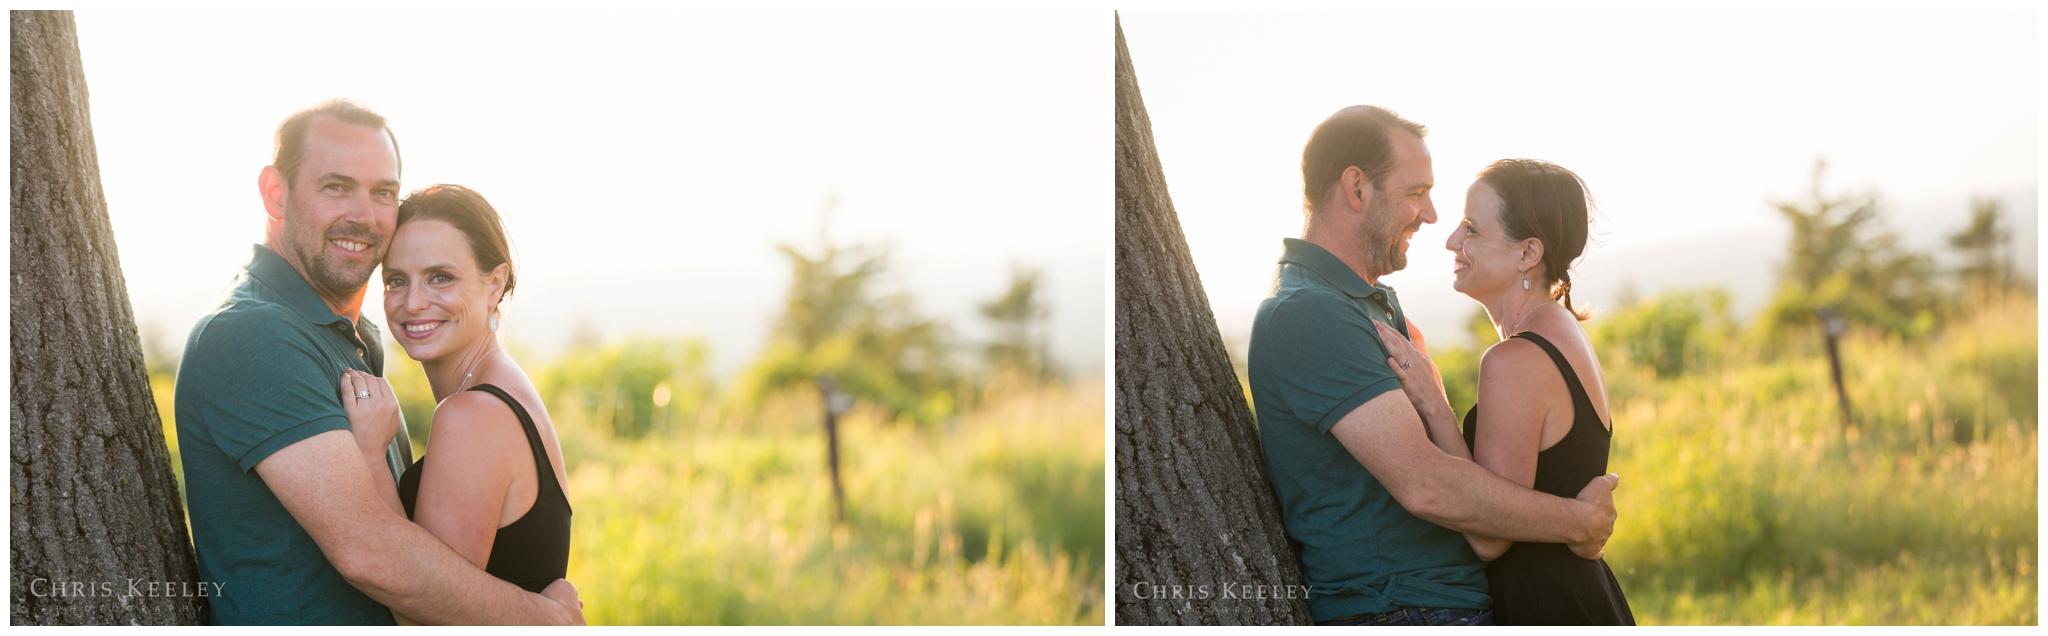 wedding-photographer-dover-new-hampshire-chris-keeley-photography-04.jpg